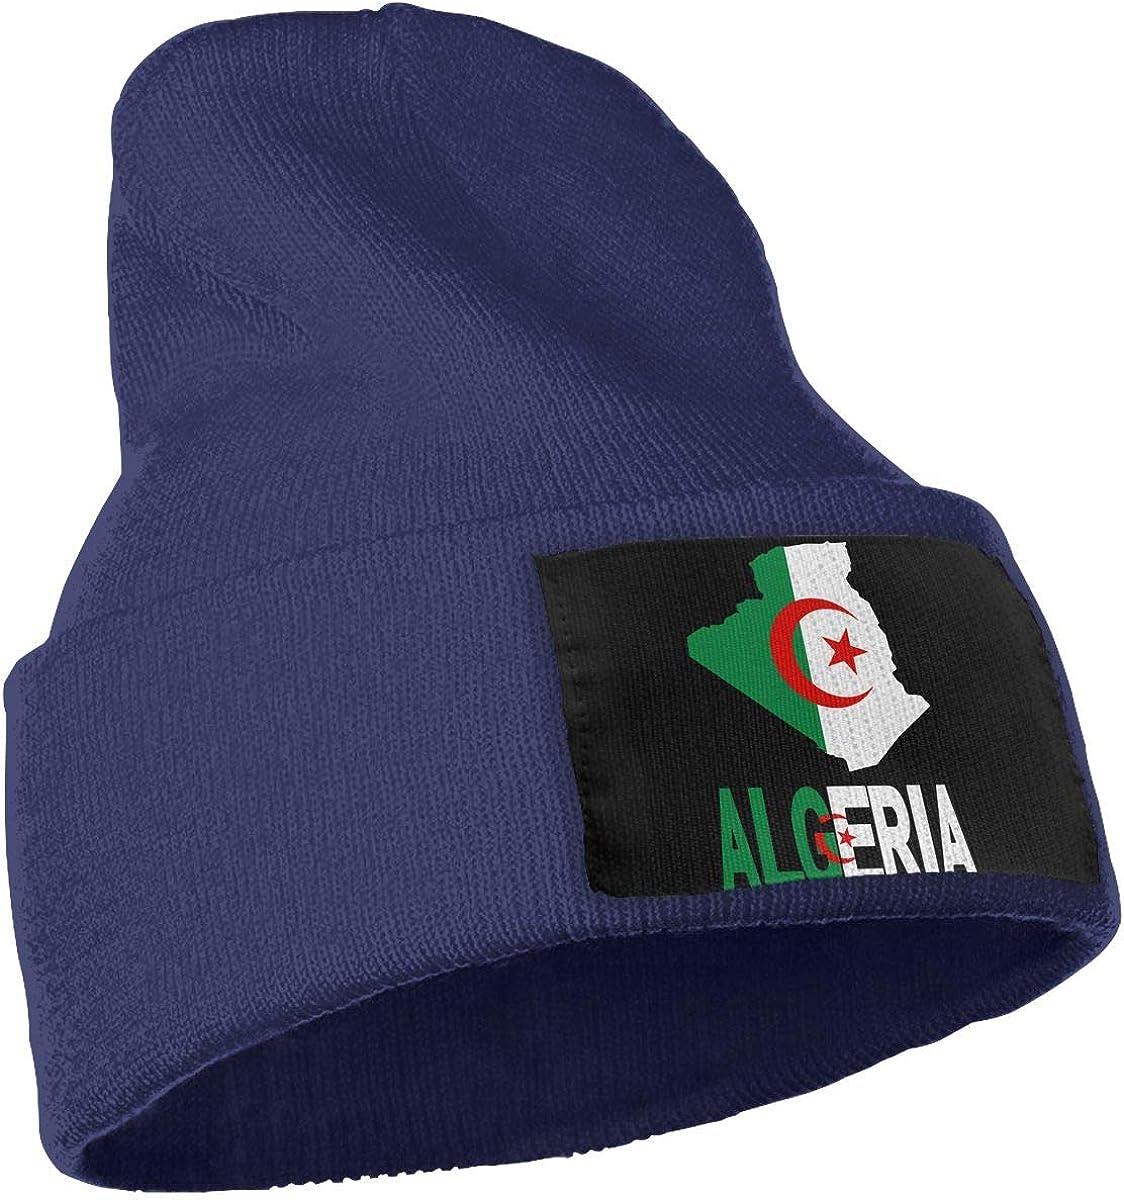 Algeria Map Flag and Text Men /& Women Knitting Hats Stretchy /& Soft Ski Cap Beanie